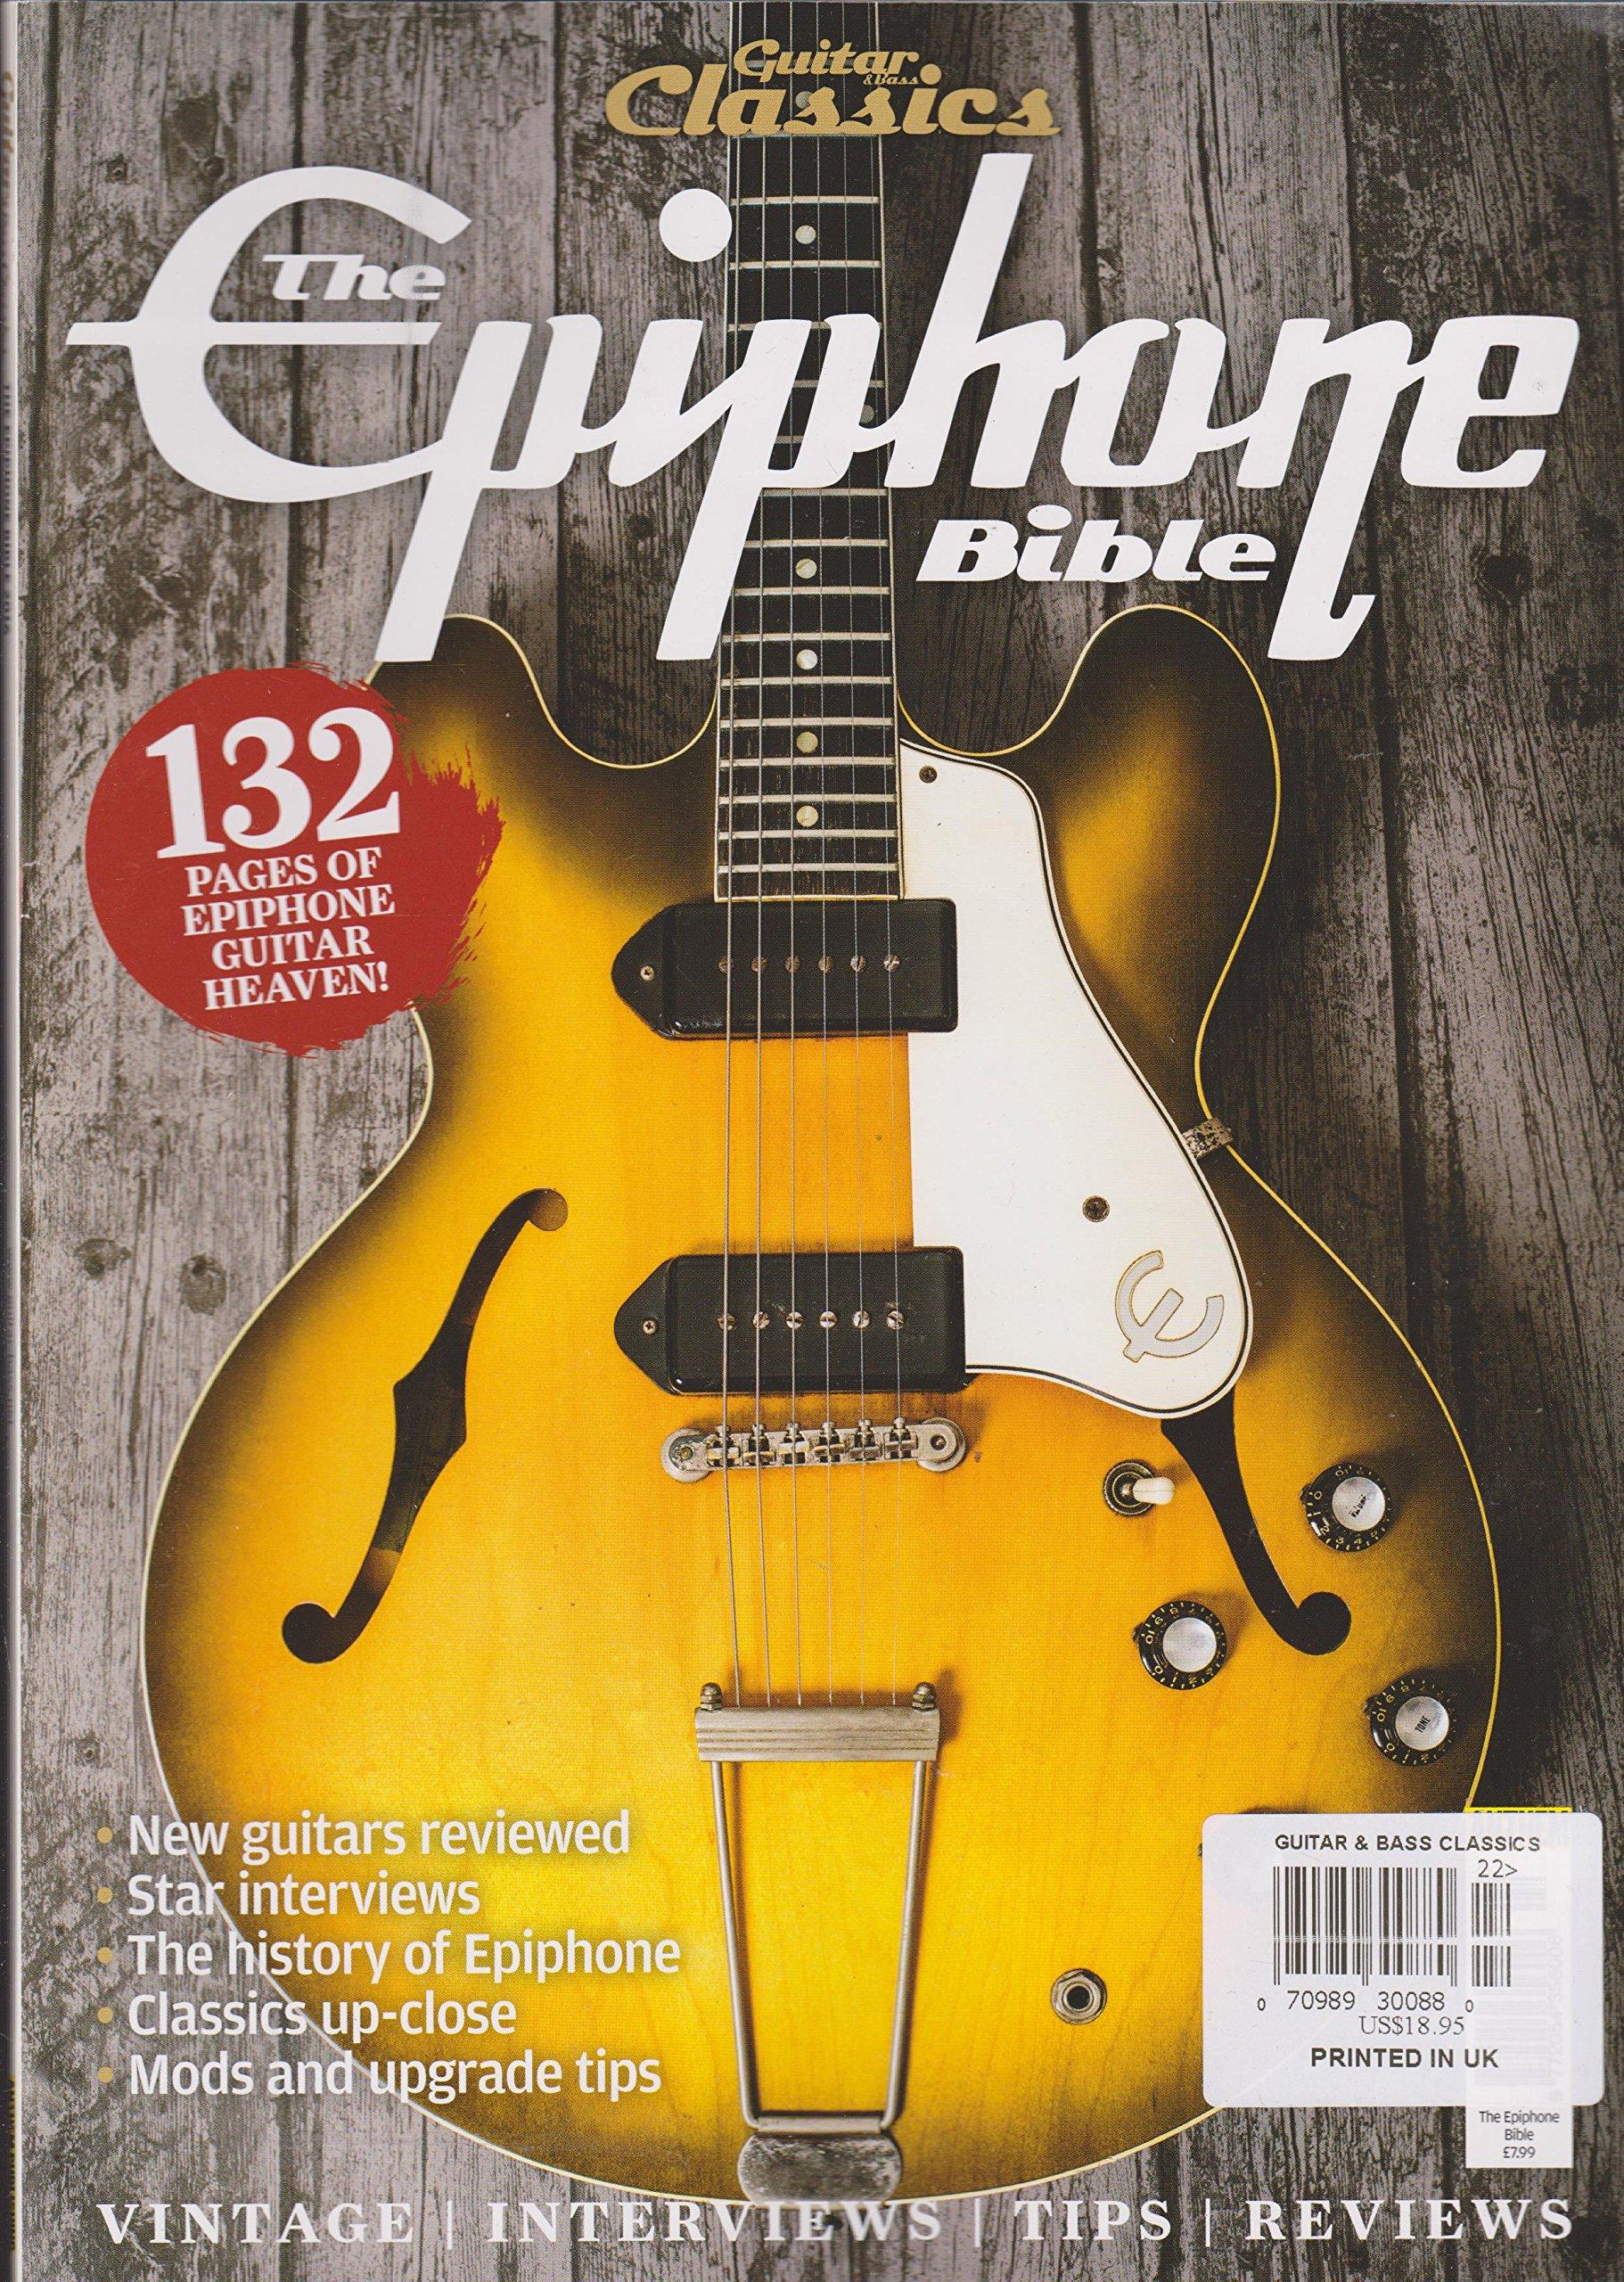 Download Guitar CLassics The Epiphone Bible Magazine 2016 PDF